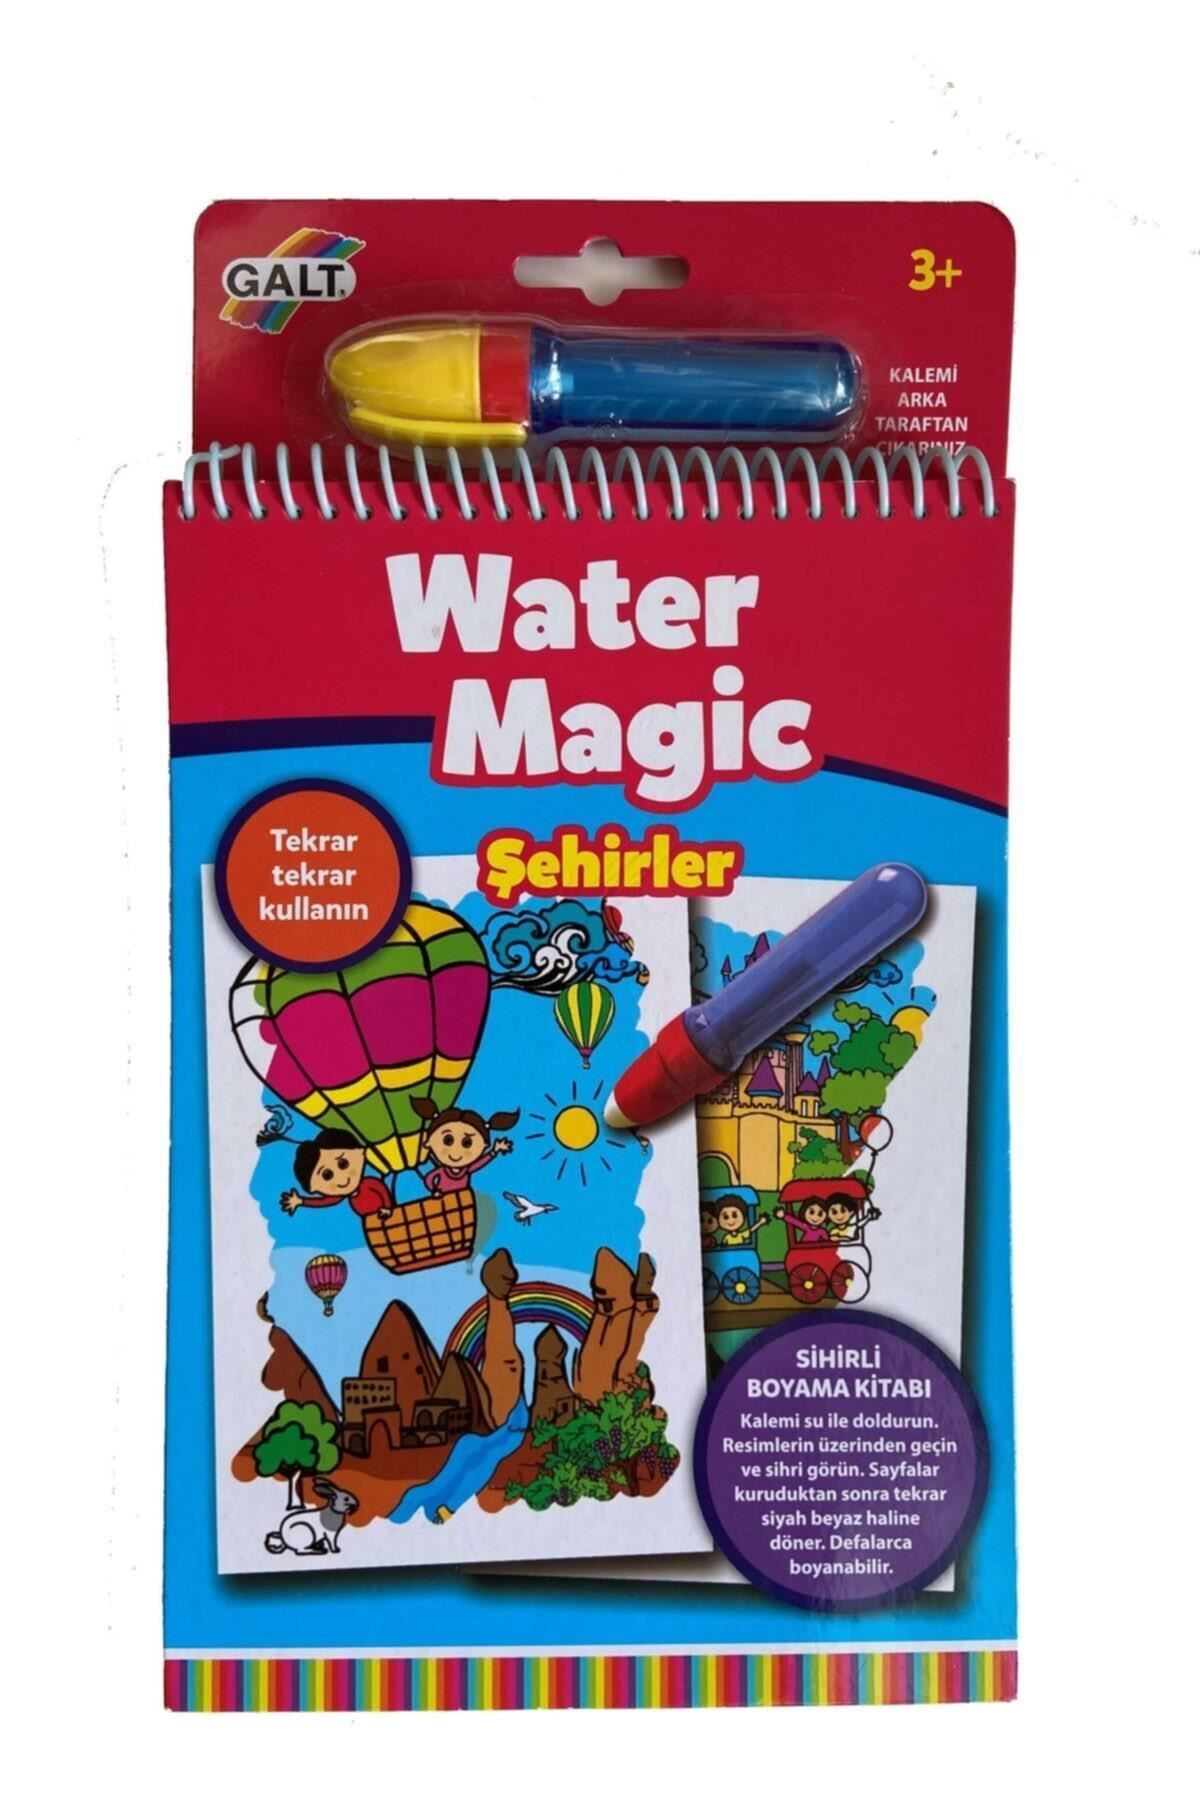 Galt Water Magic Sihirli Kitap Şehirler 3 Yaş+